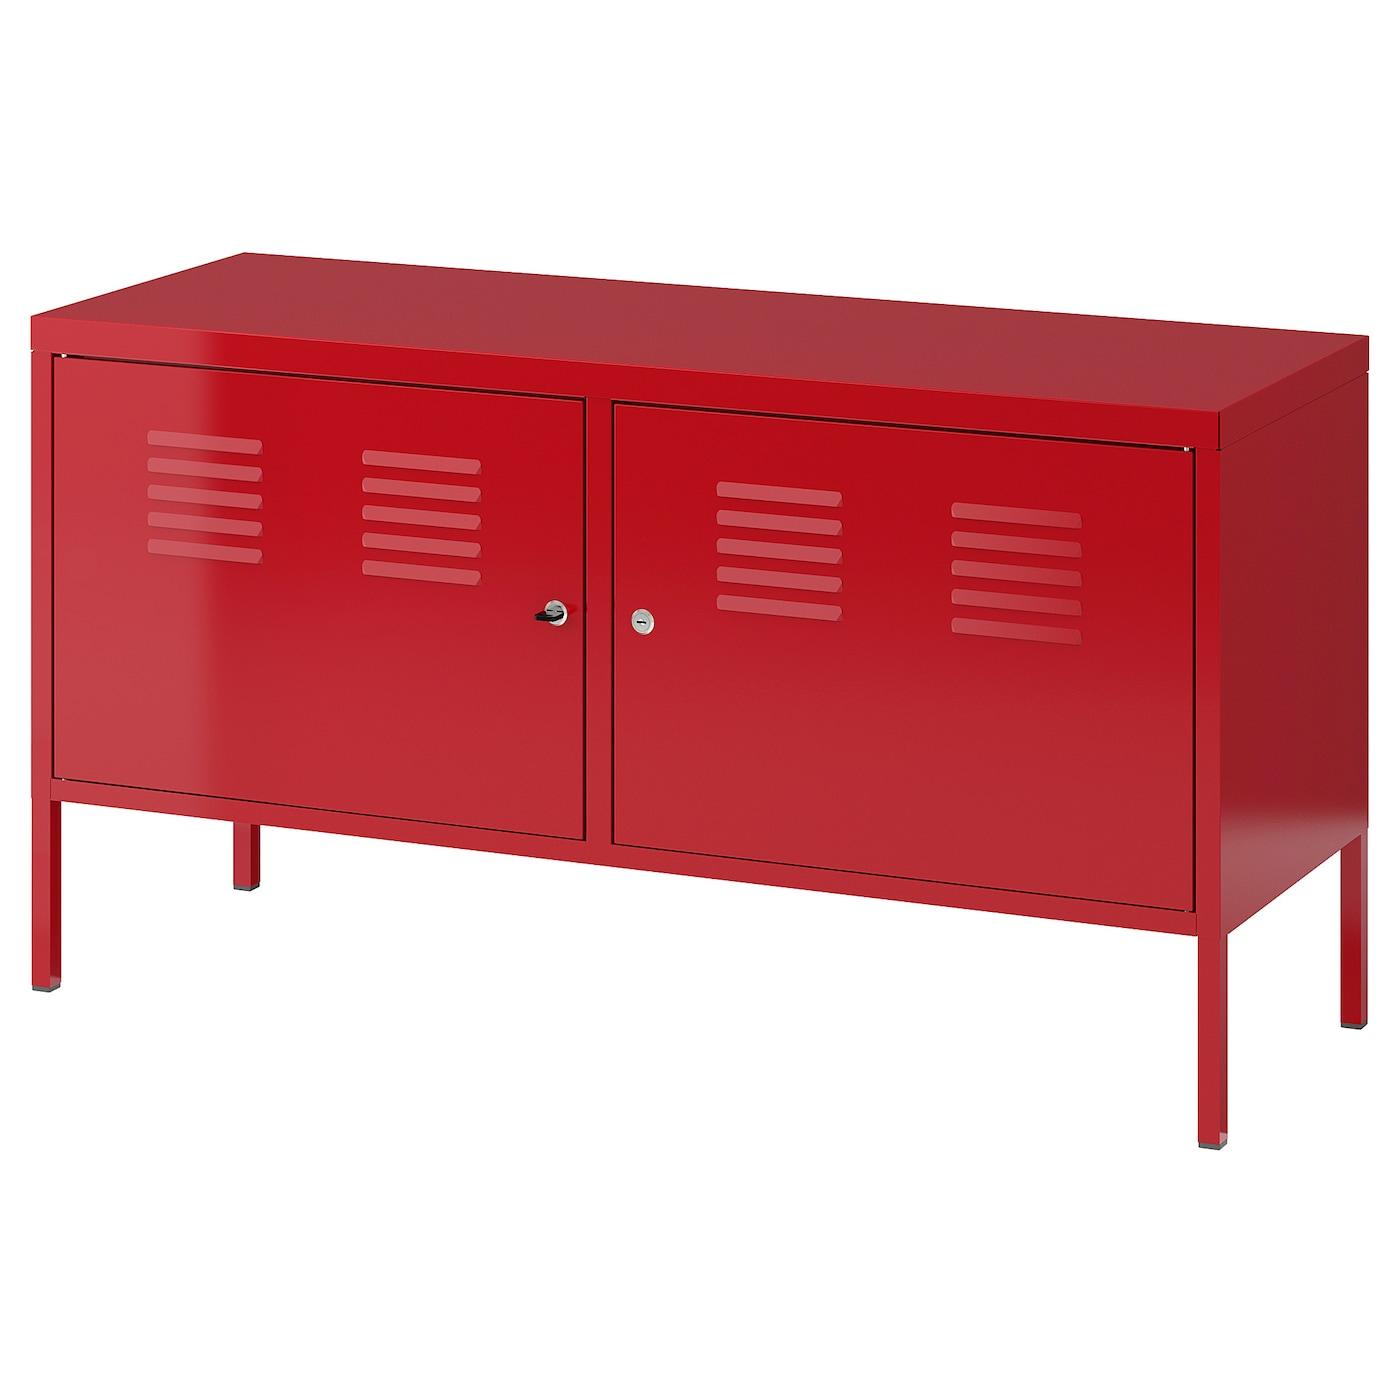 ikea ps armoire m tallique rouge 119 x 63 cm ikea. Black Bedroom Furniture Sets. Home Design Ideas